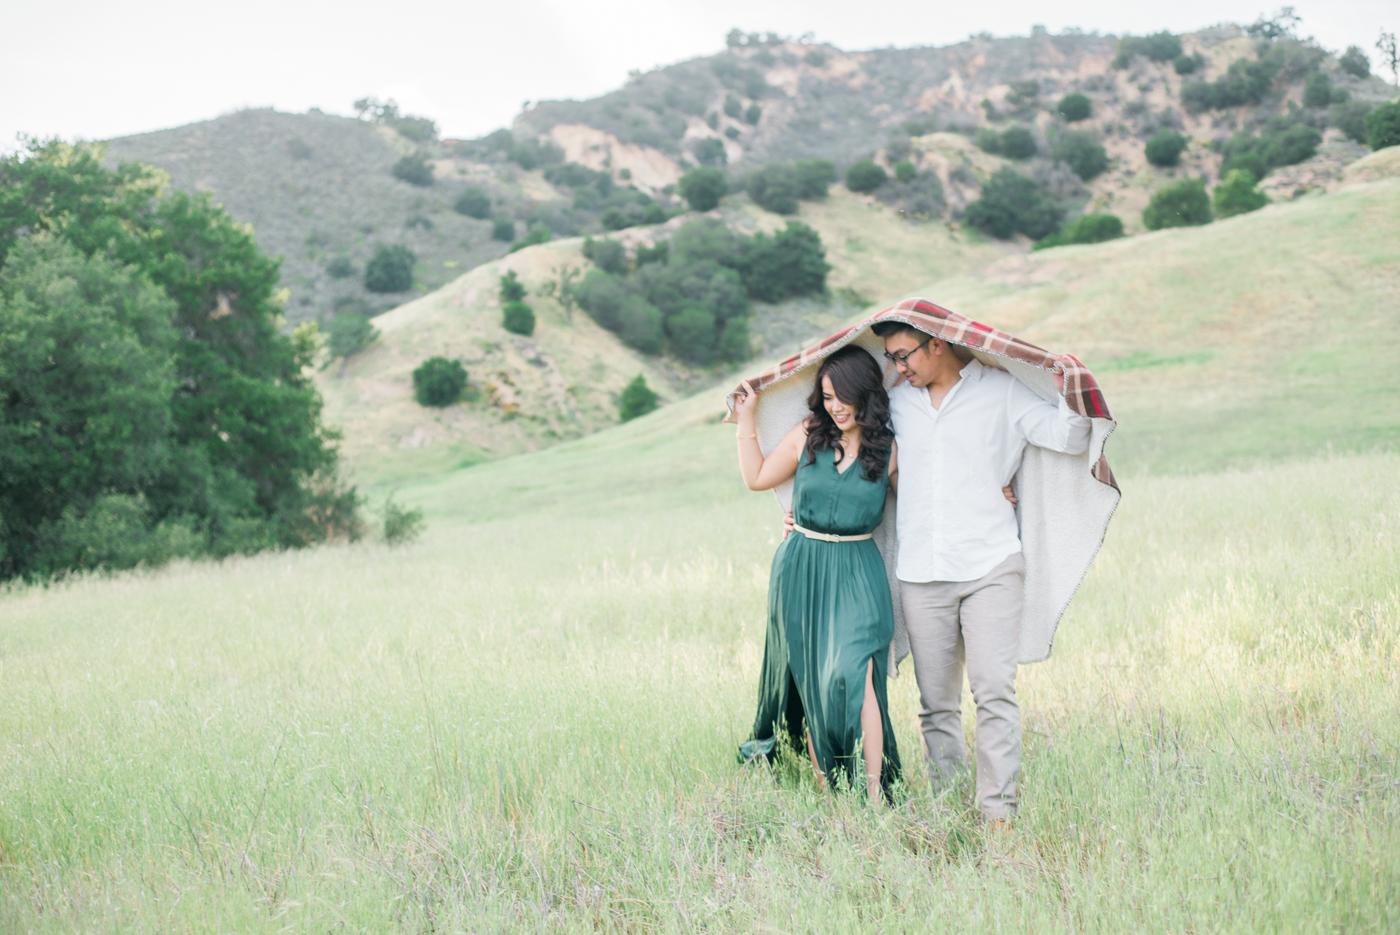 dianne&christian-malibu-creek-state-park-engagement-session-photography-los-angeles-based-wedding-photographer-6.jpg